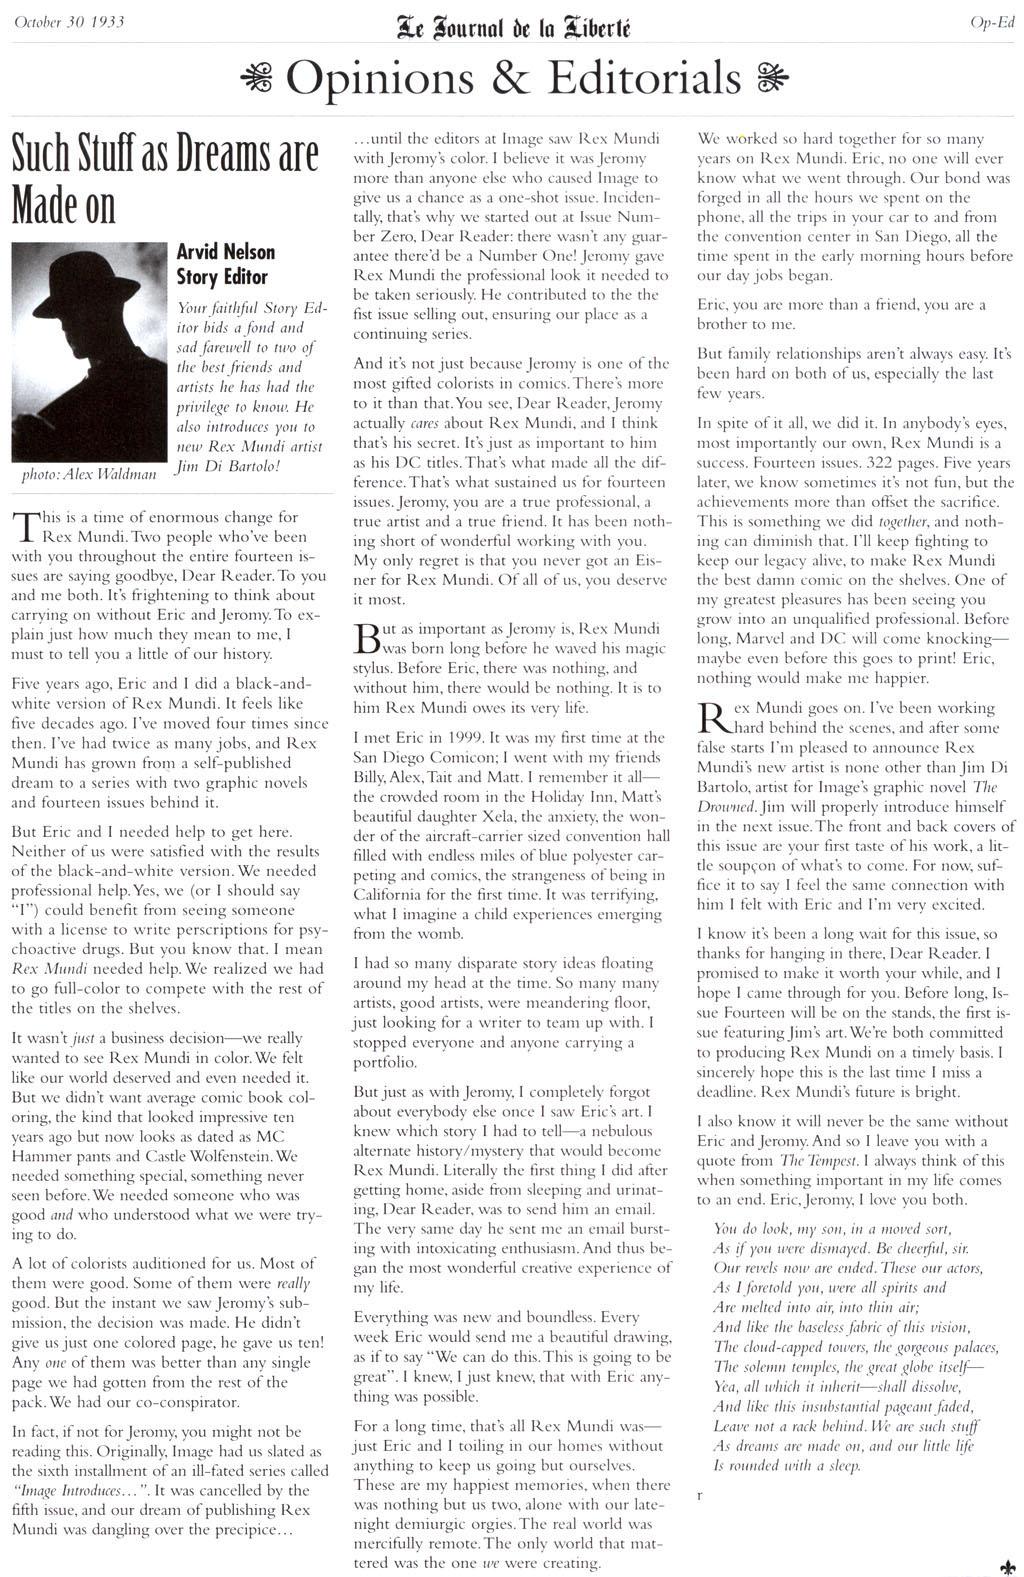 Read online Rex Mundi comic -  Issue #13 - 26